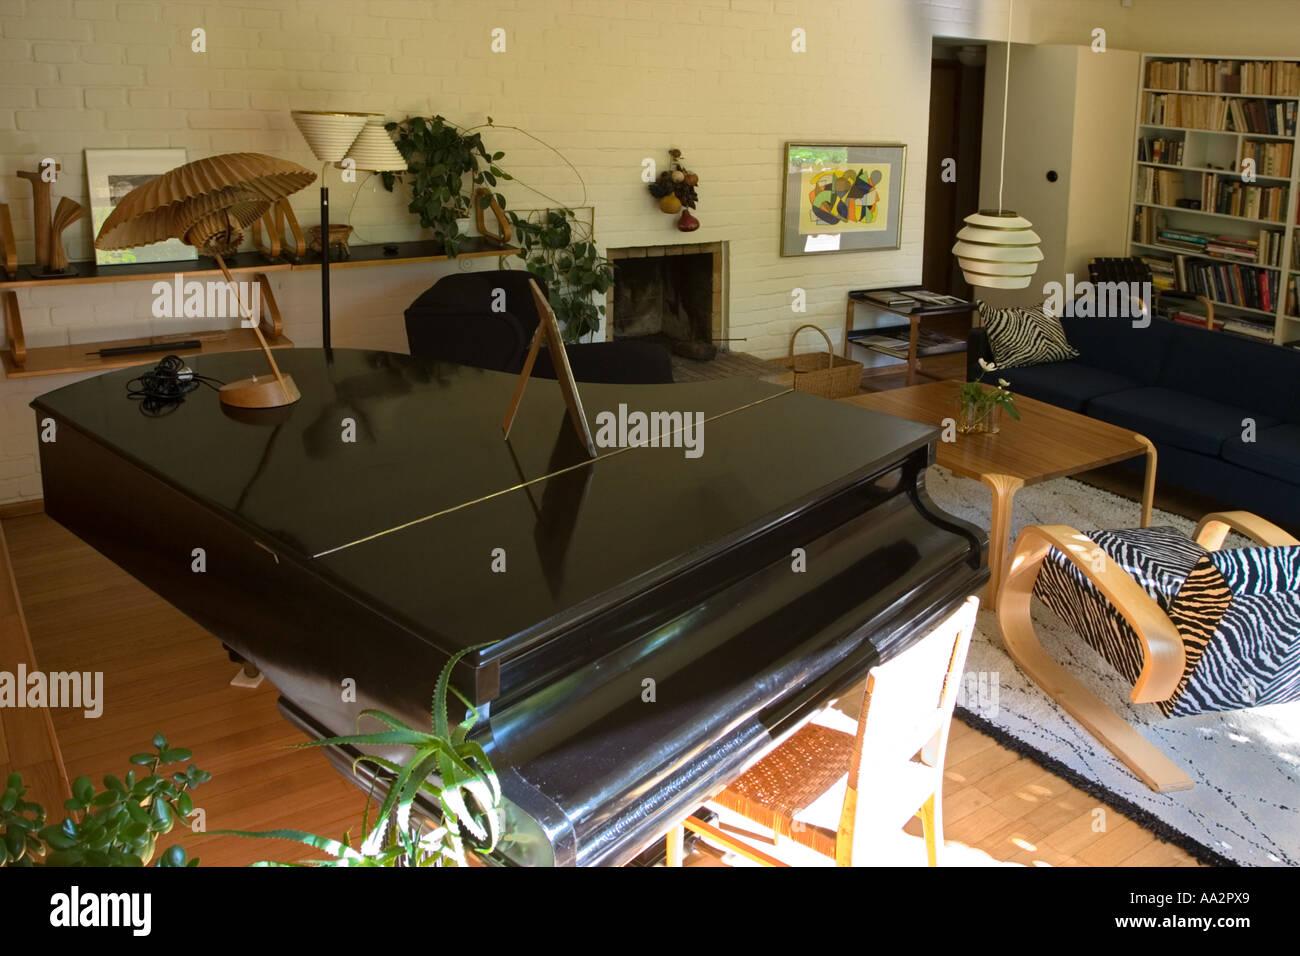 aalto interior stockfotos aalto interior bilder alamy. Black Bedroom Furniture Sets. Home Design Ideas